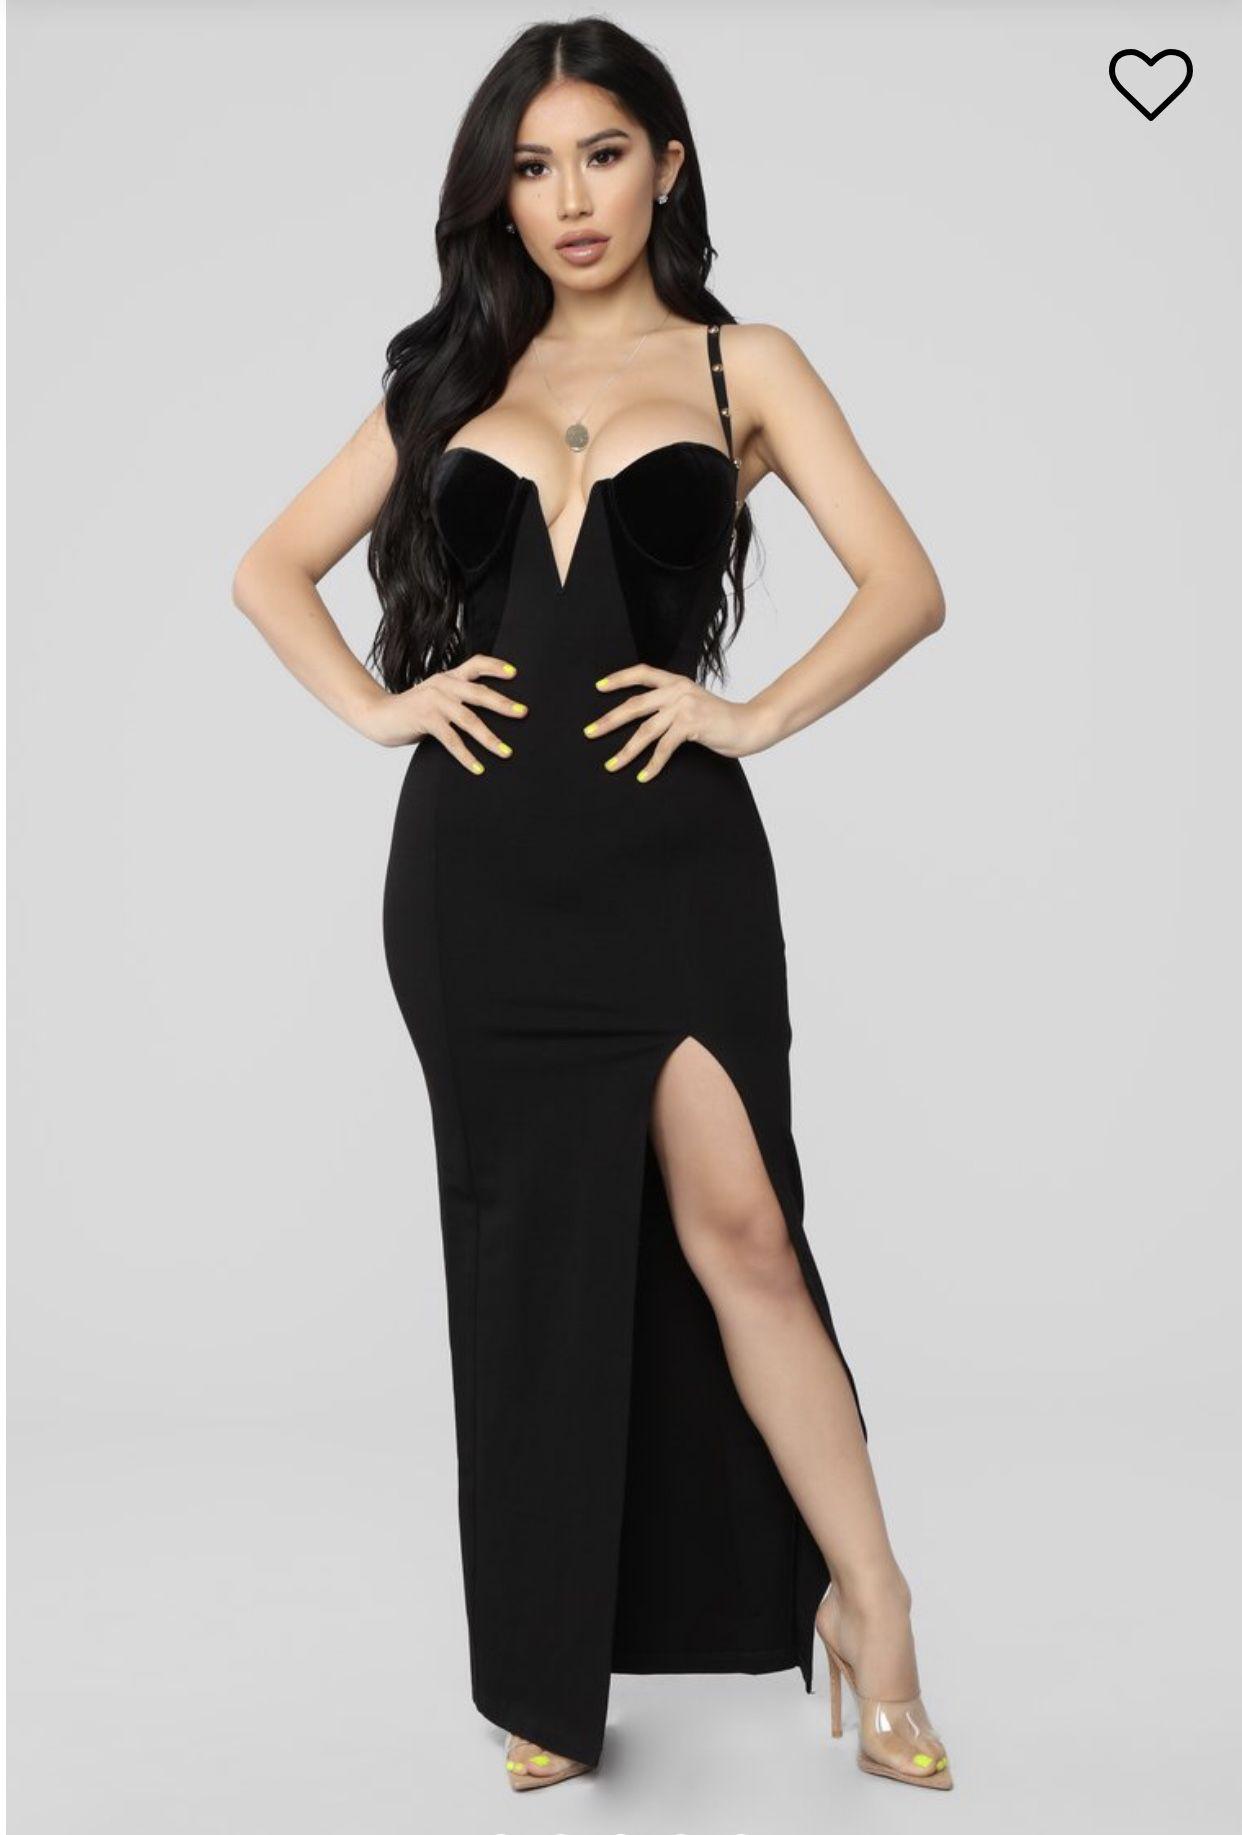 Sexy Nicole Rochell nude photos 2019